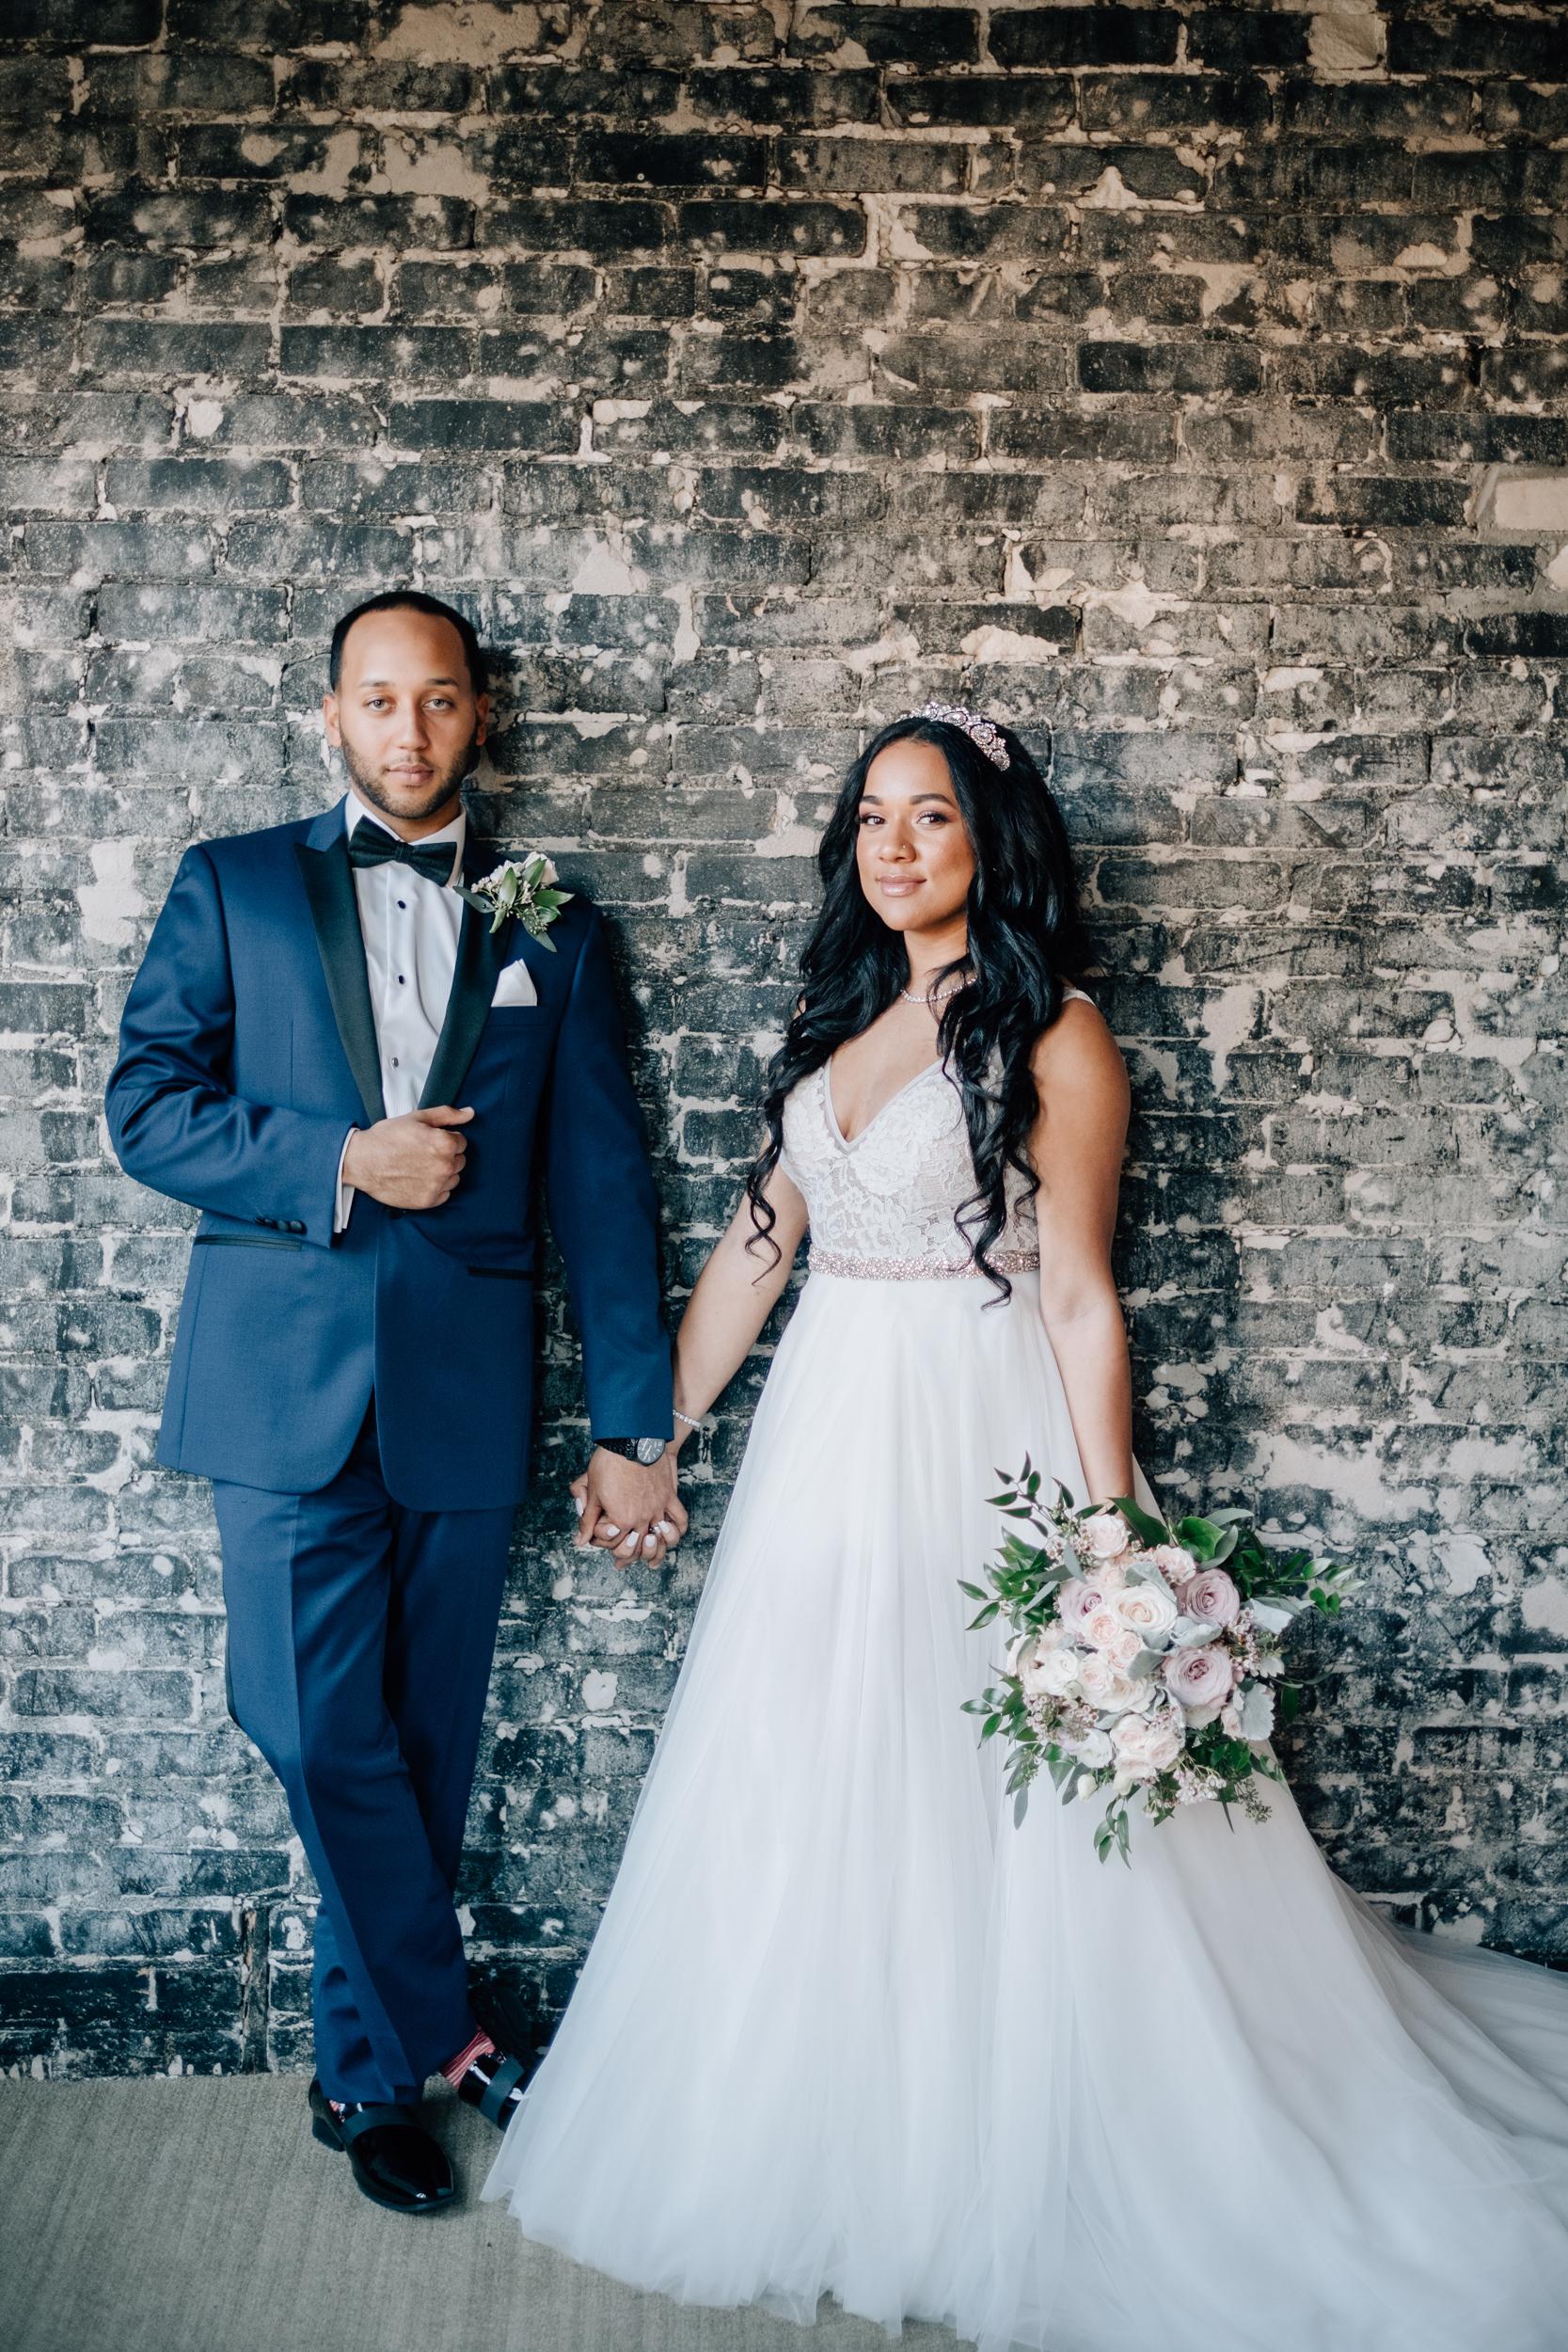 Amethyst Weddings - Erwin & Alondra Preview 004  web.jpg